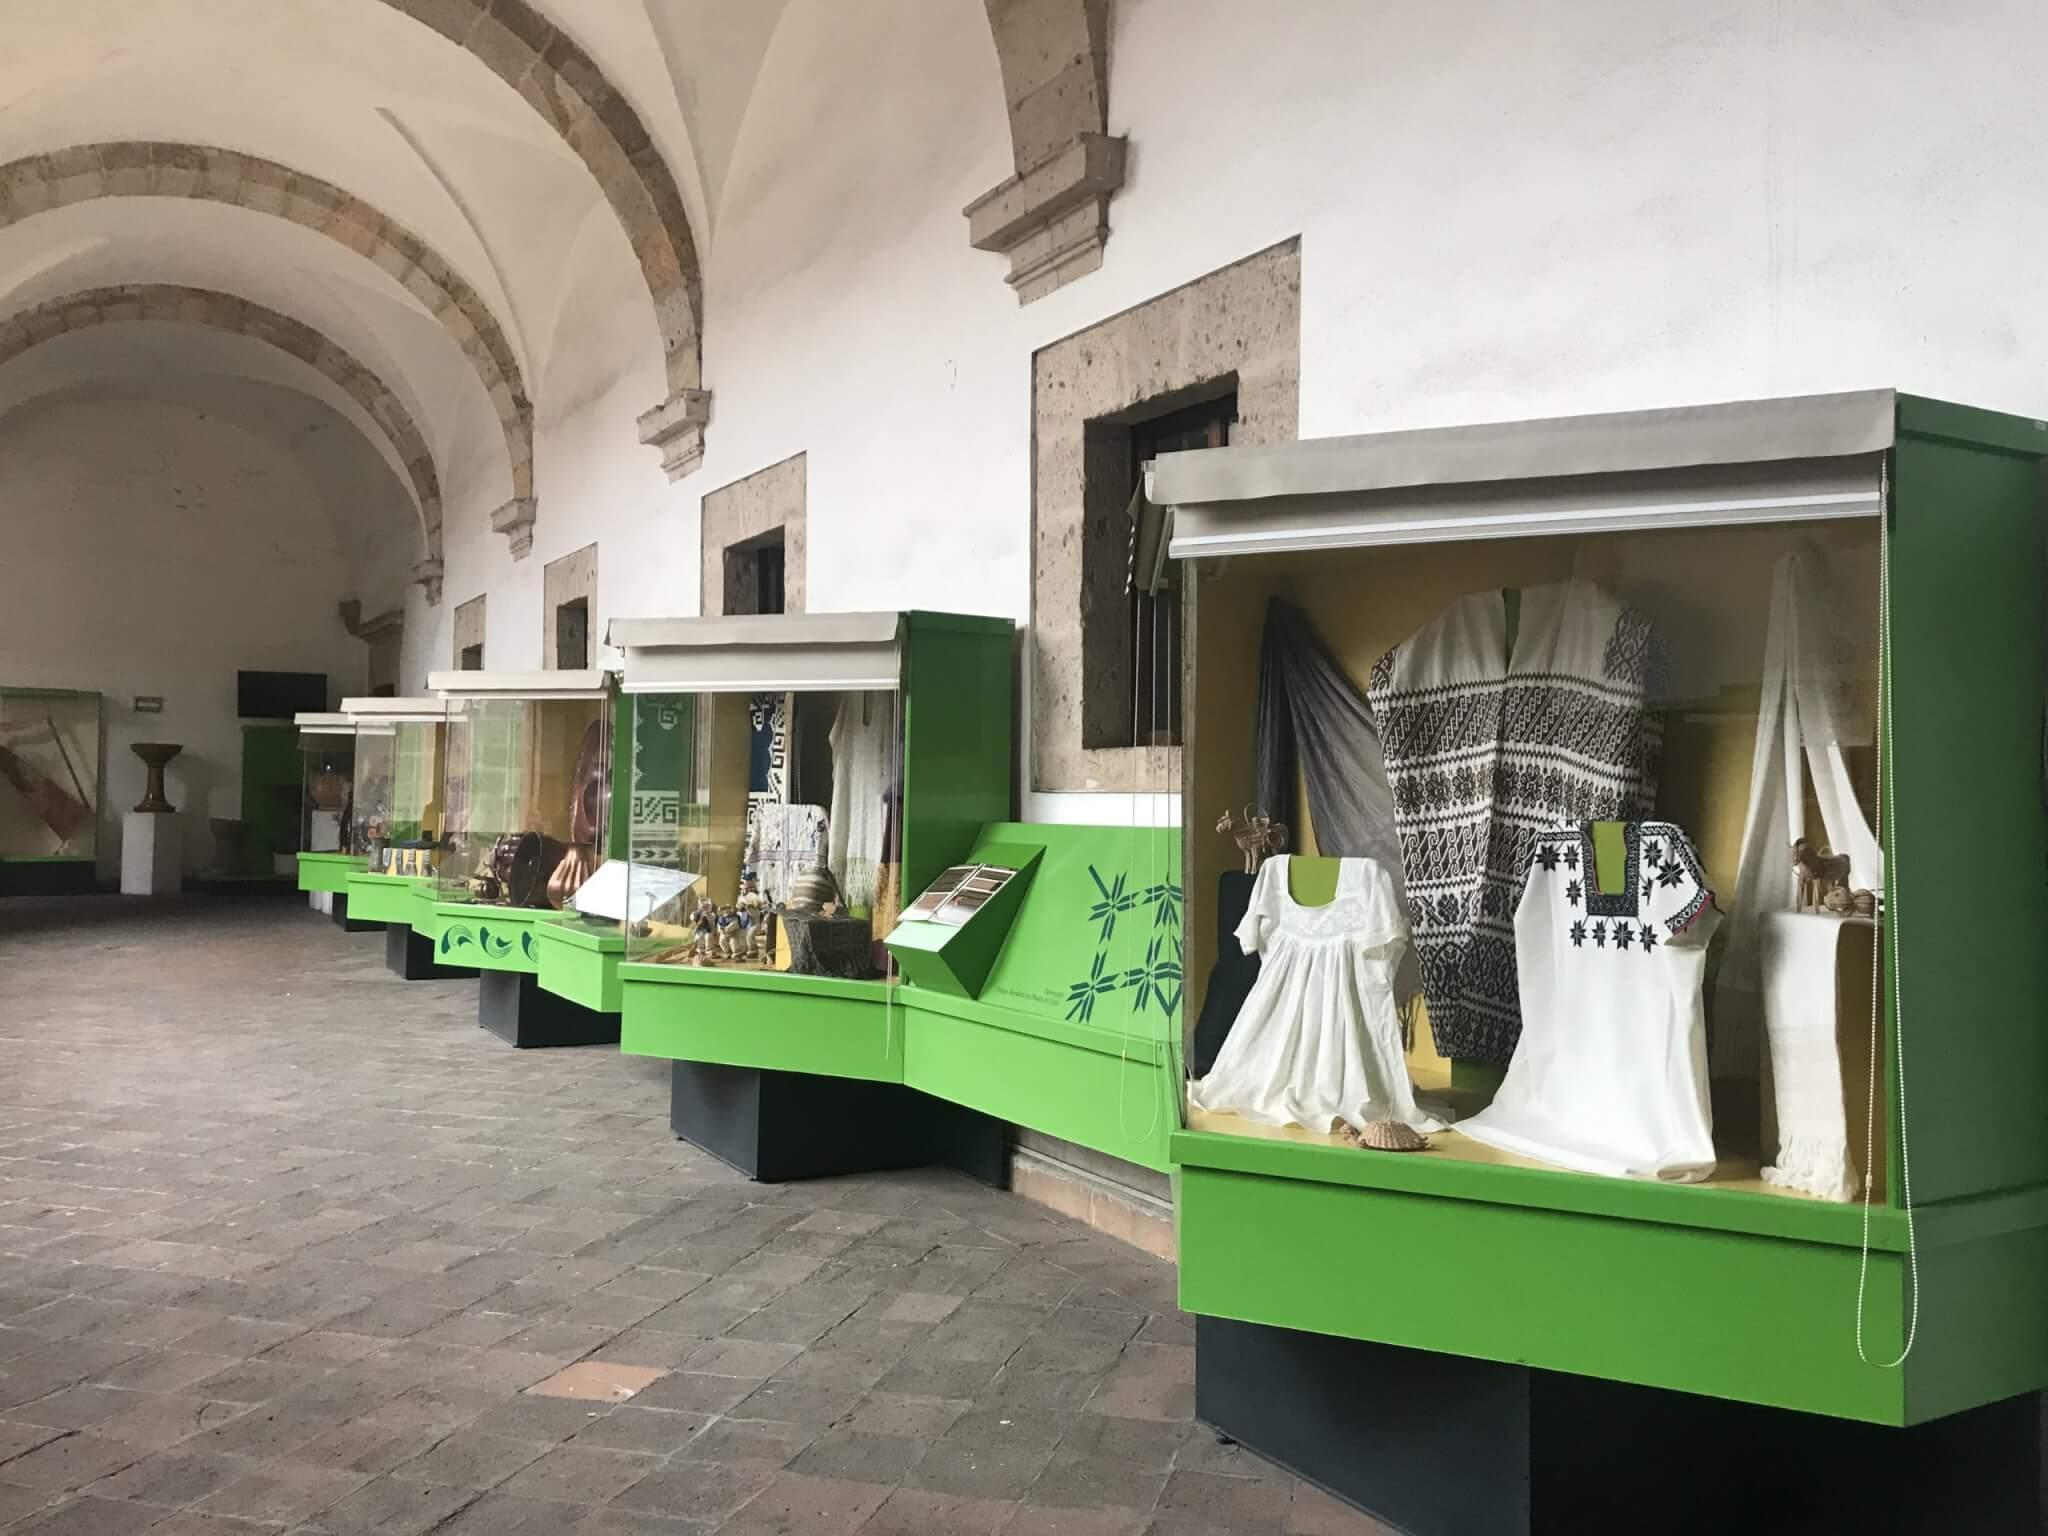 Visit Michoacán: House of Handicrafts